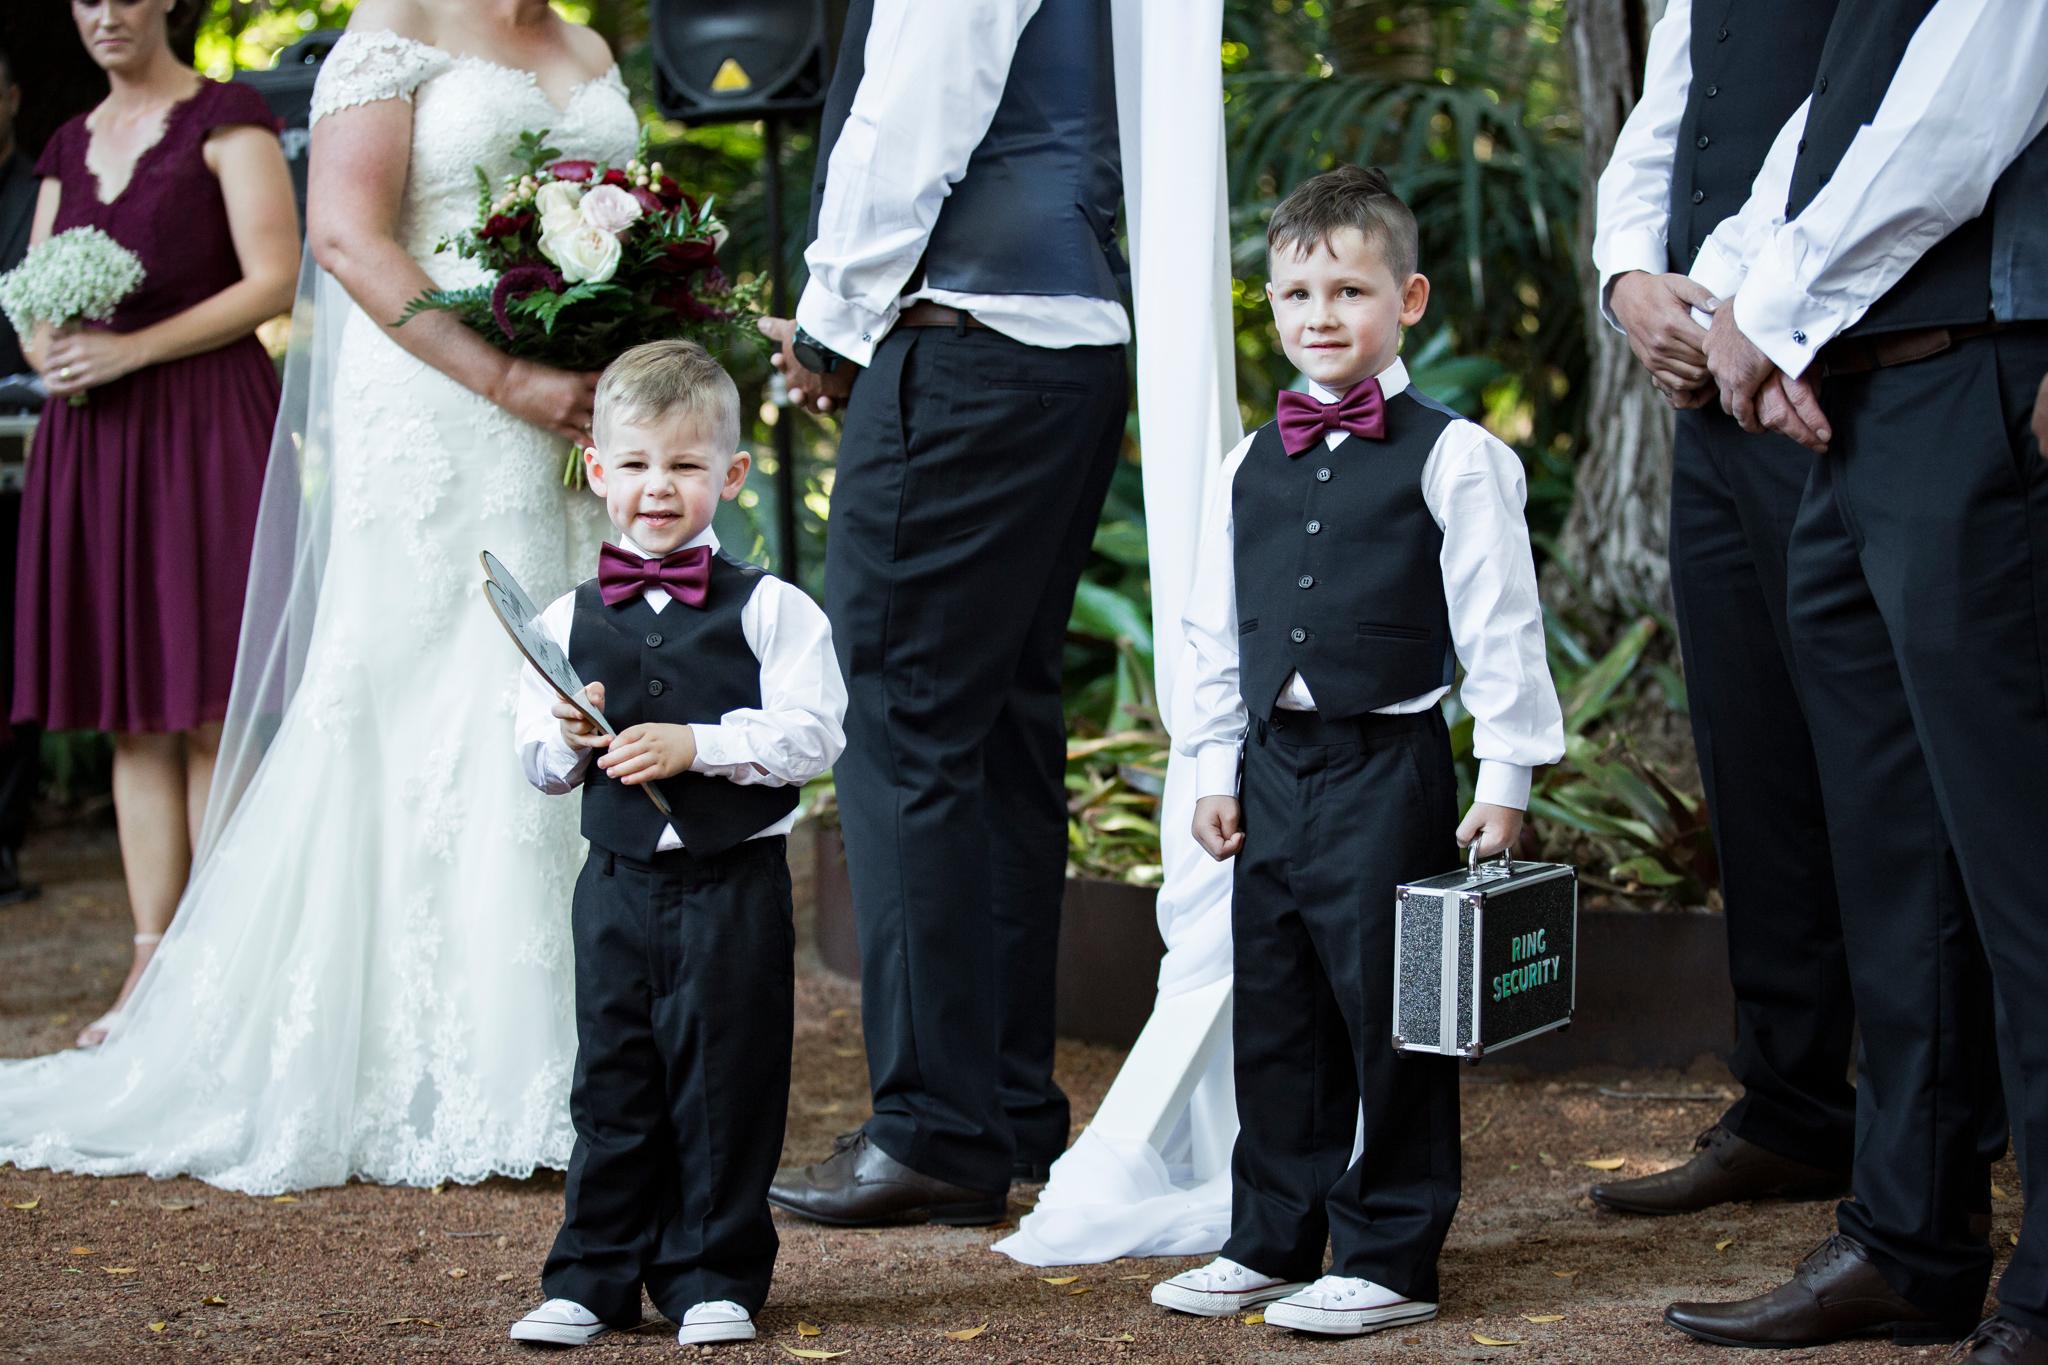 Kyme-steve-wedding-58.jpg